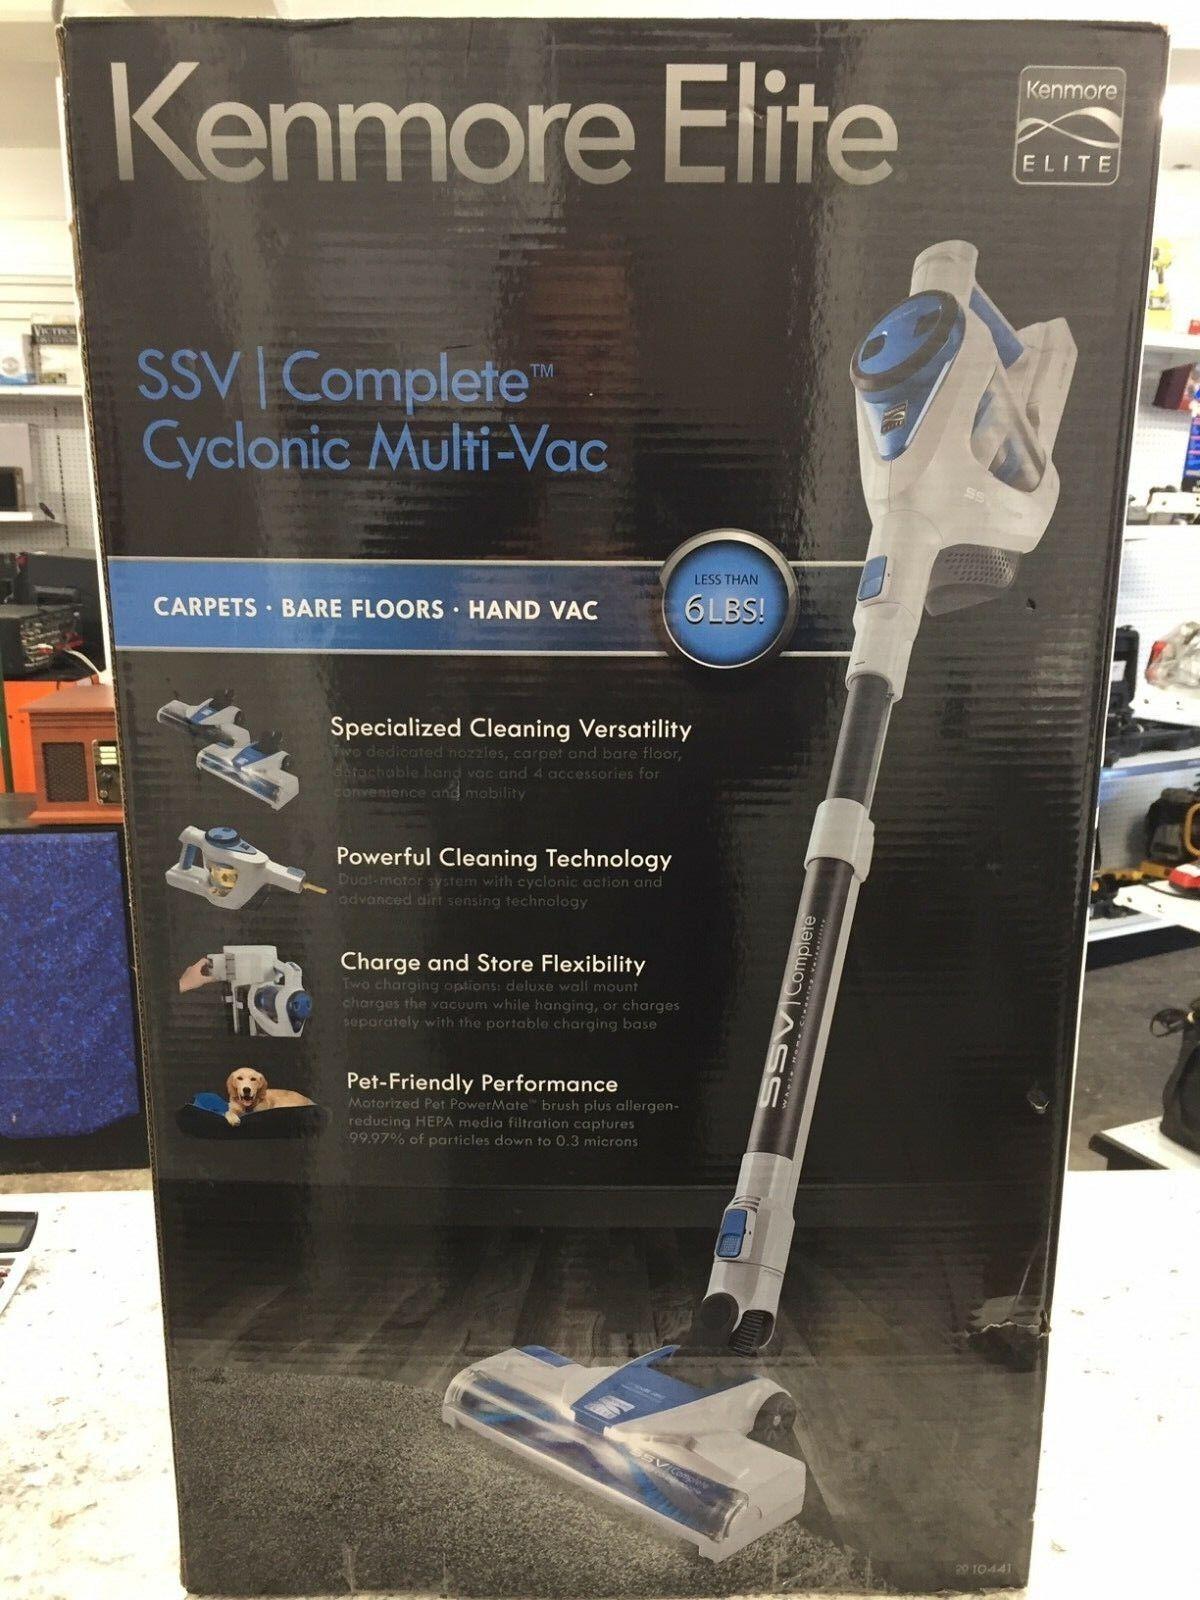 New Kenmore Elite 10441 SSVI Complete™ Cylconic Multi-Vac blueeee